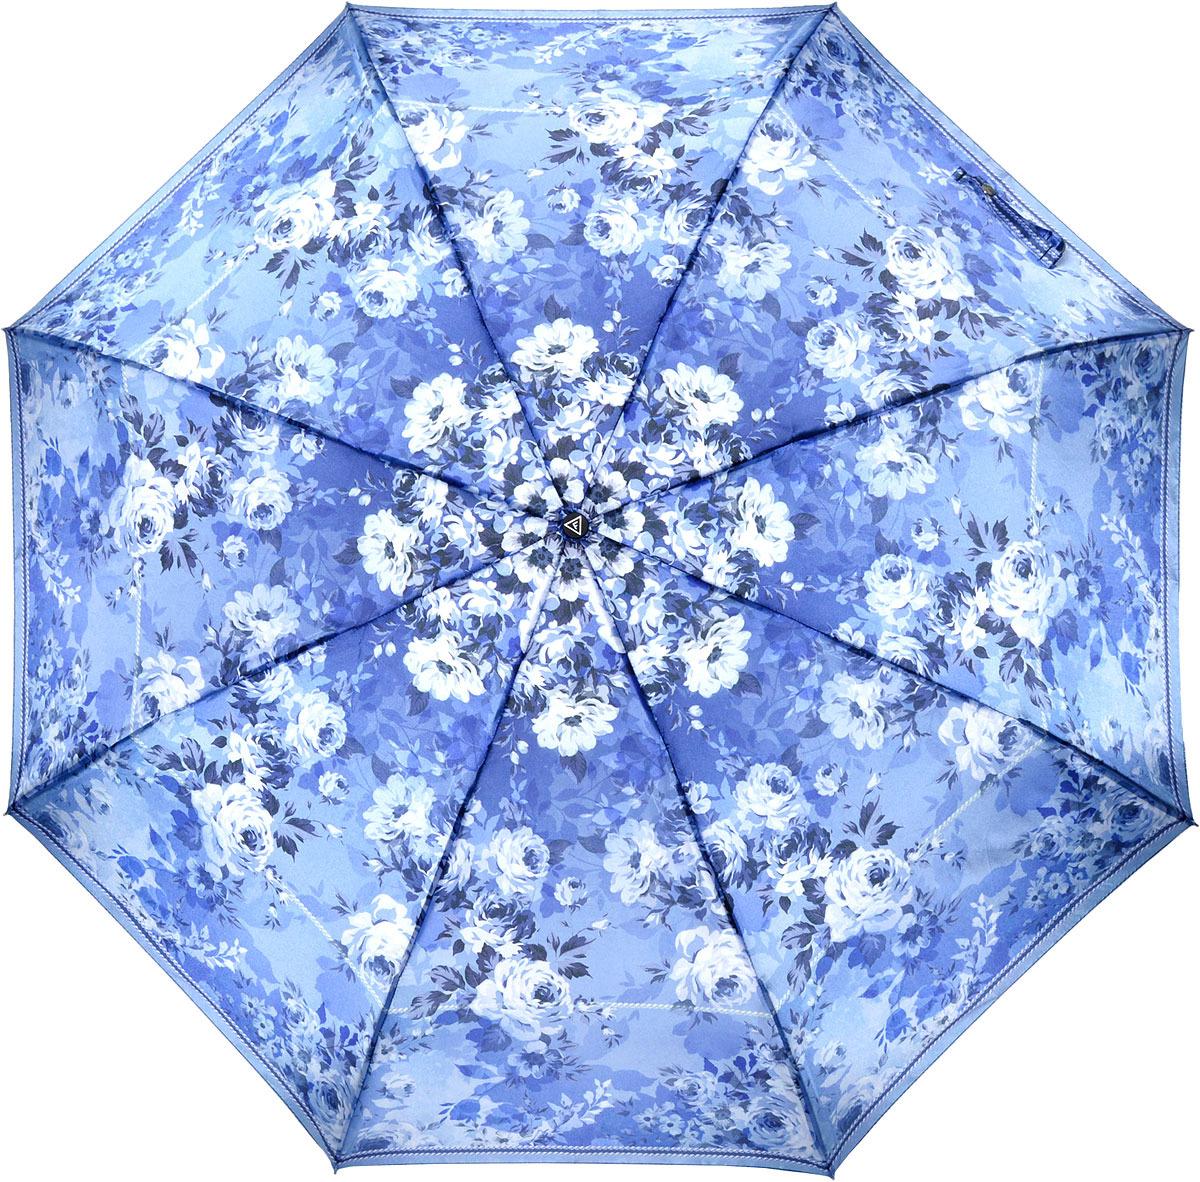 Зонт женский Fabretti, автомат, 3 сложения, цвет: синий. S-18102-11